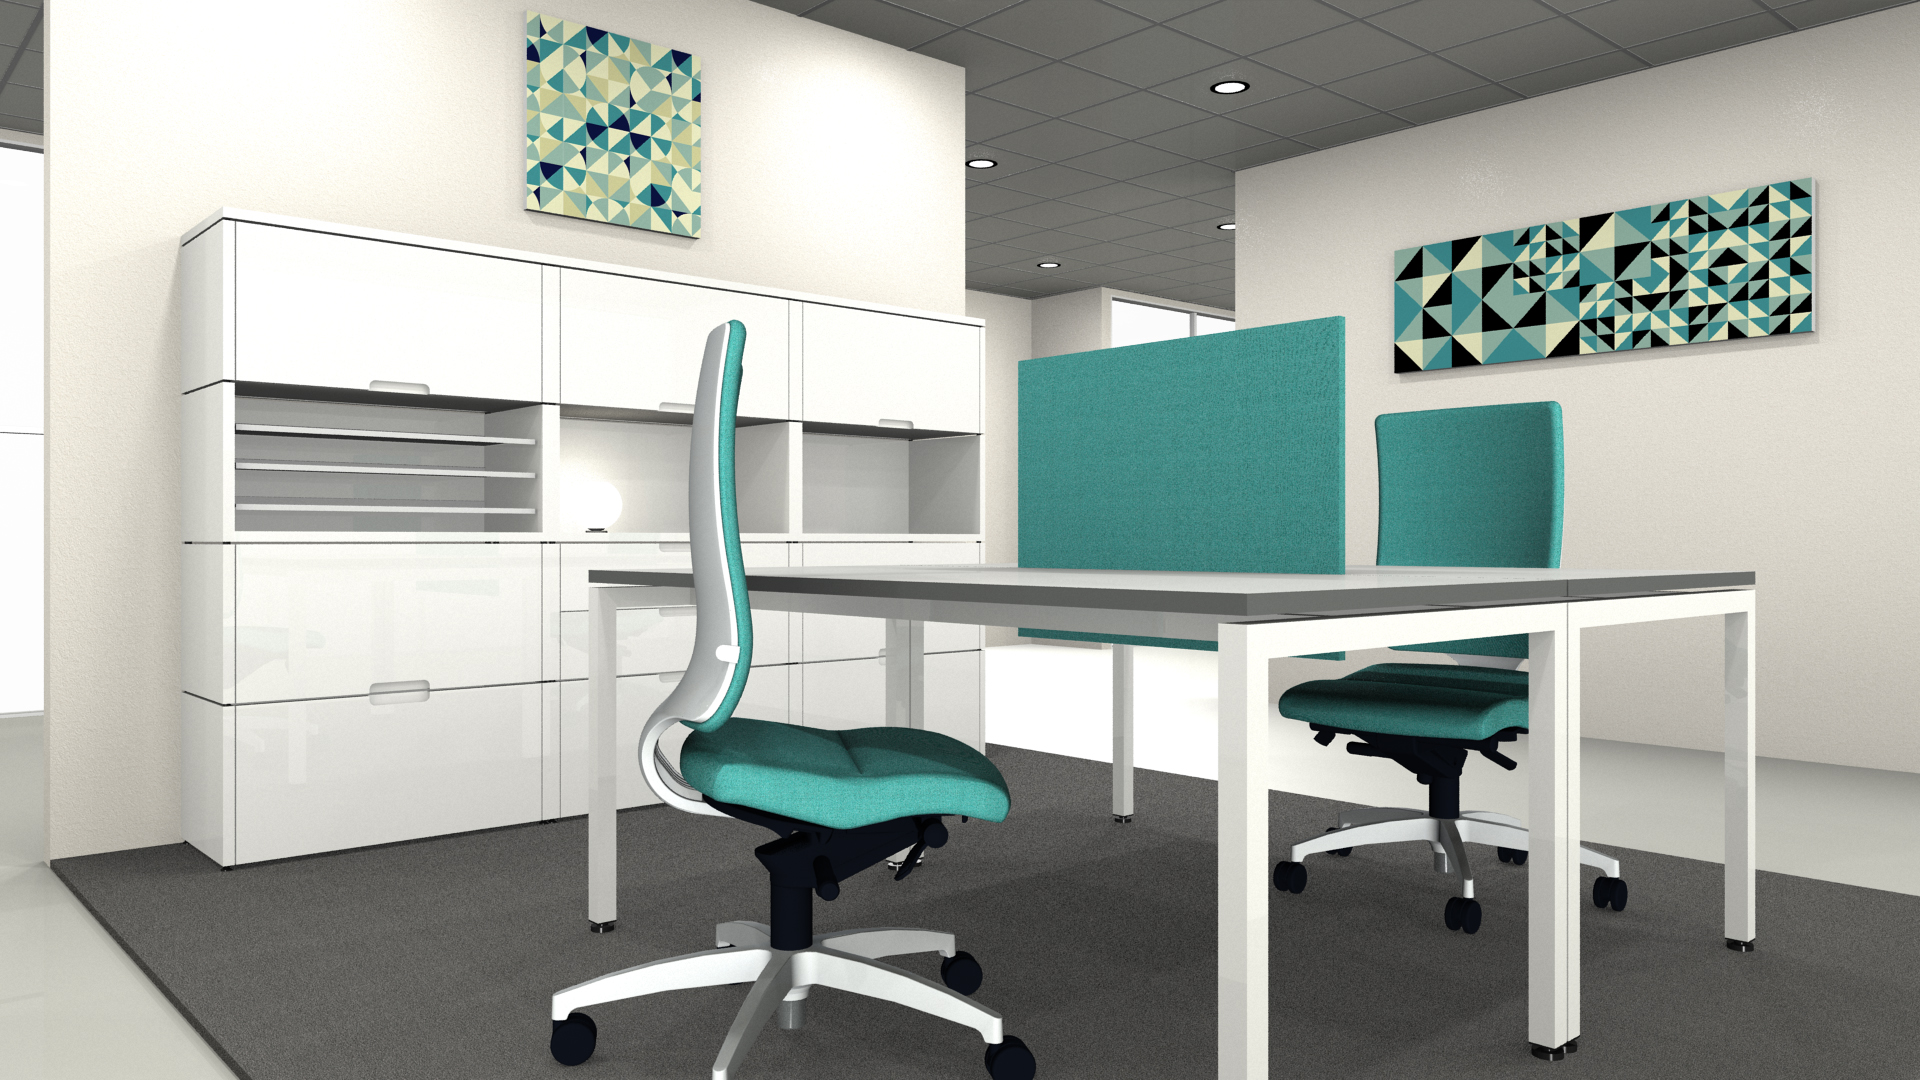 Creative-Office-Furniture-Design-Catalogue-H35-For-Your-Home-Design-Ideas-with-Office-Furniture-Design-Catalogue